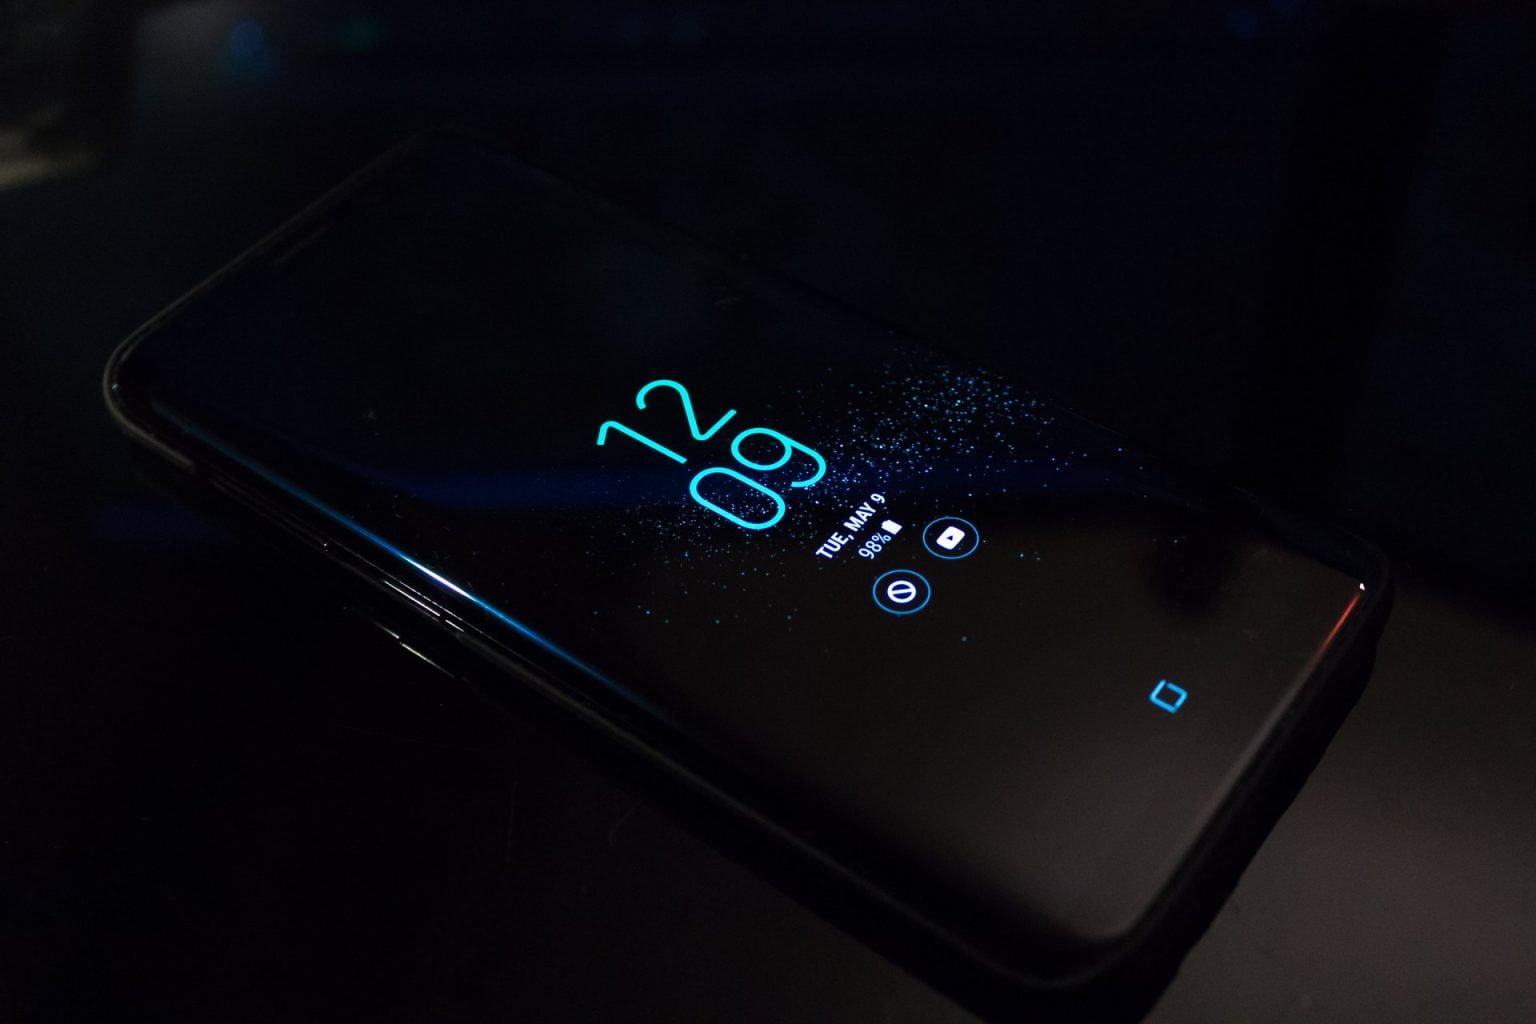 8 Cara Menyadap HP Android Termudah | Sadap Smartphone Terbaru